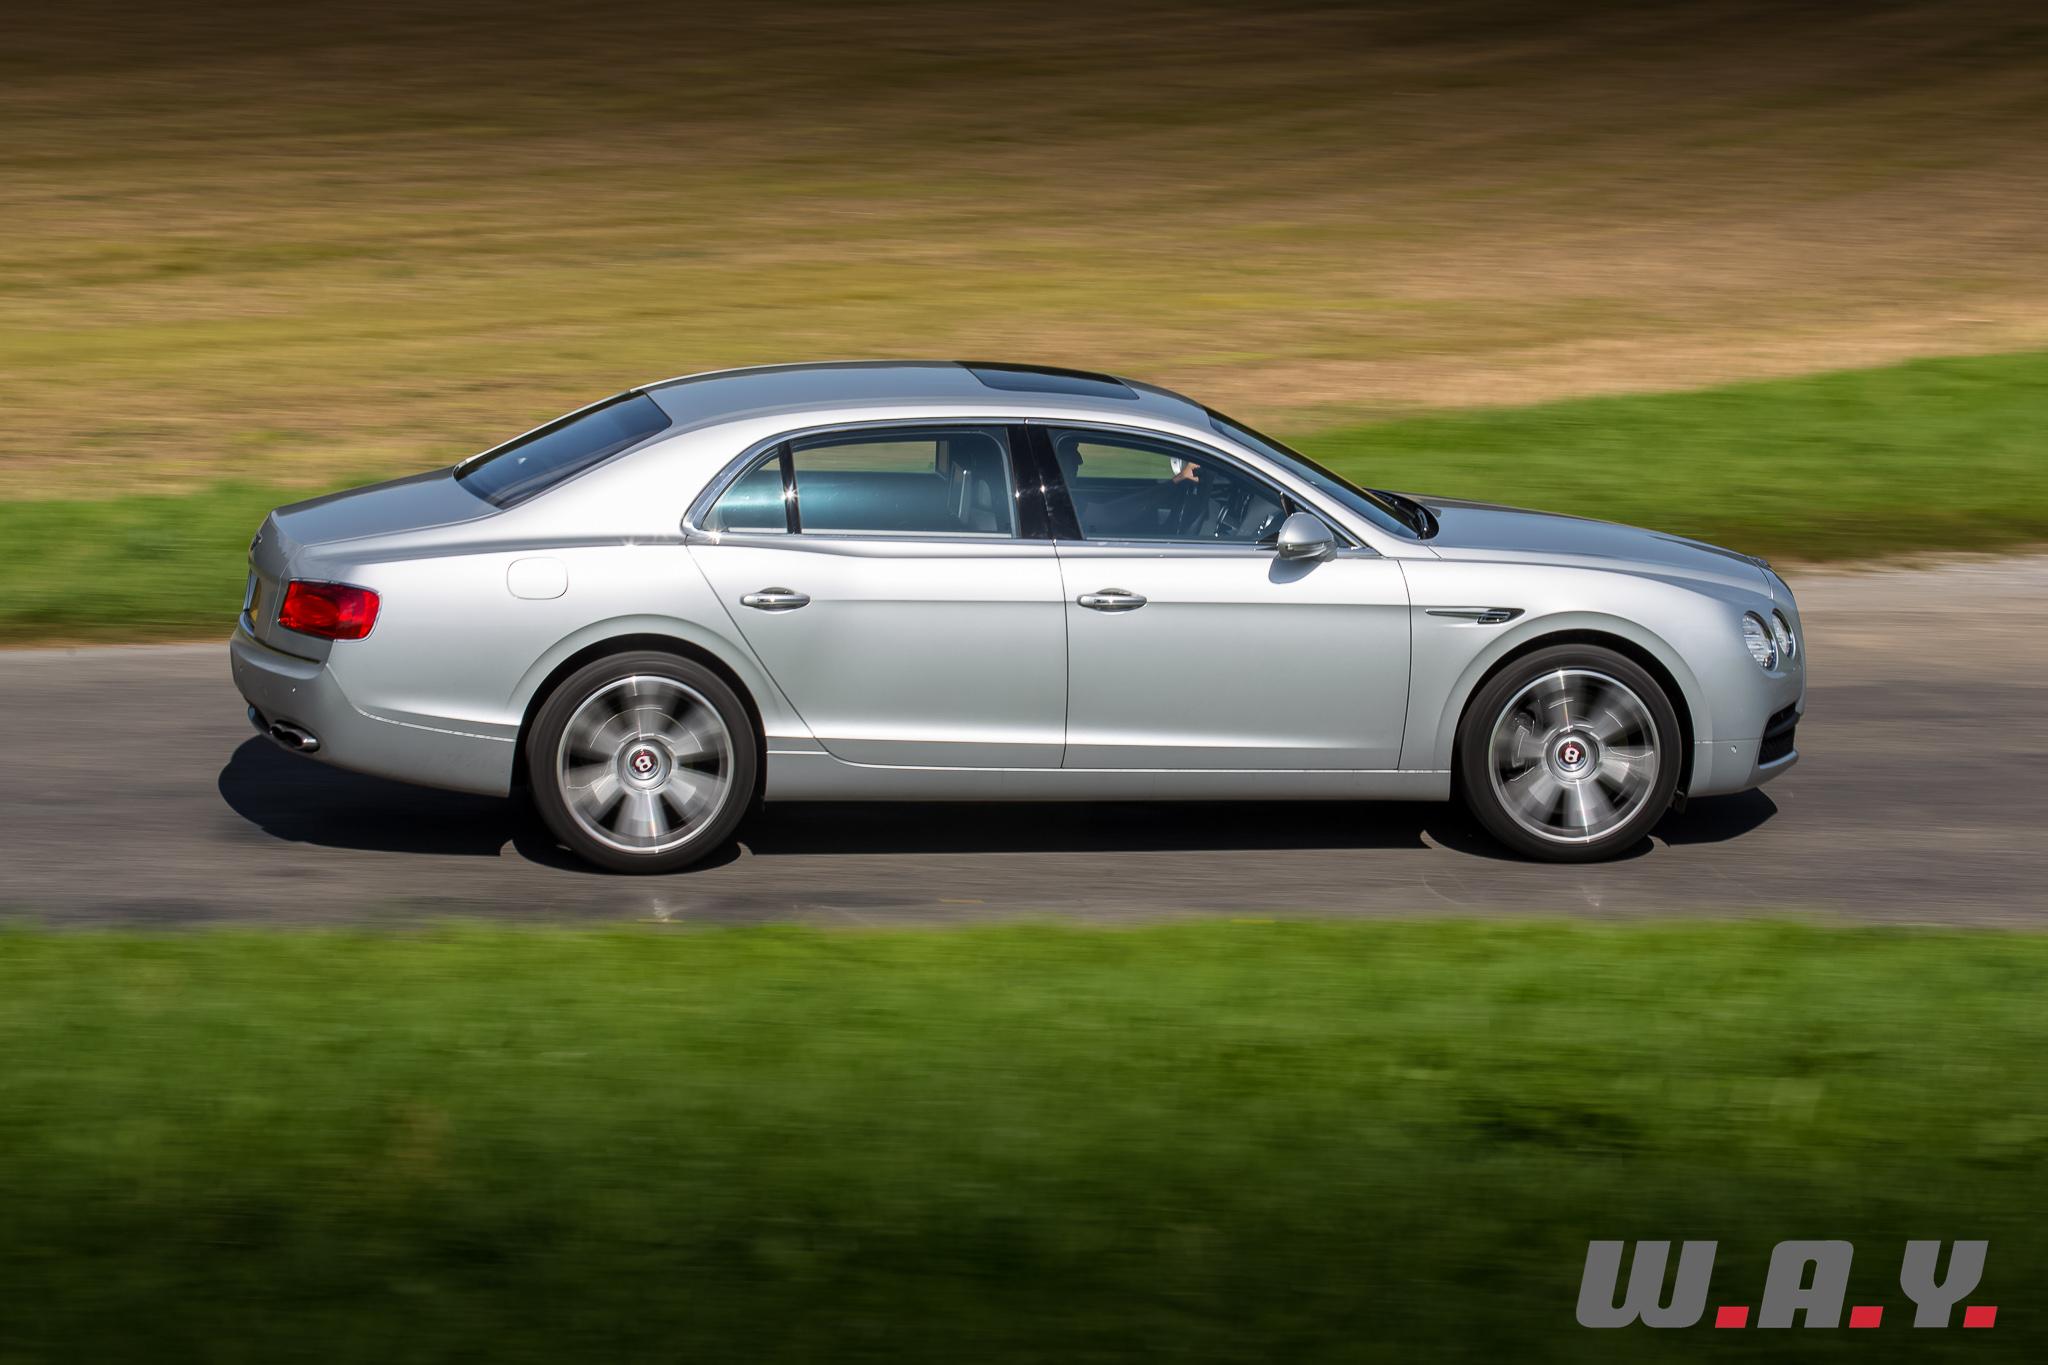 BentleyFlyingSpurV8-12